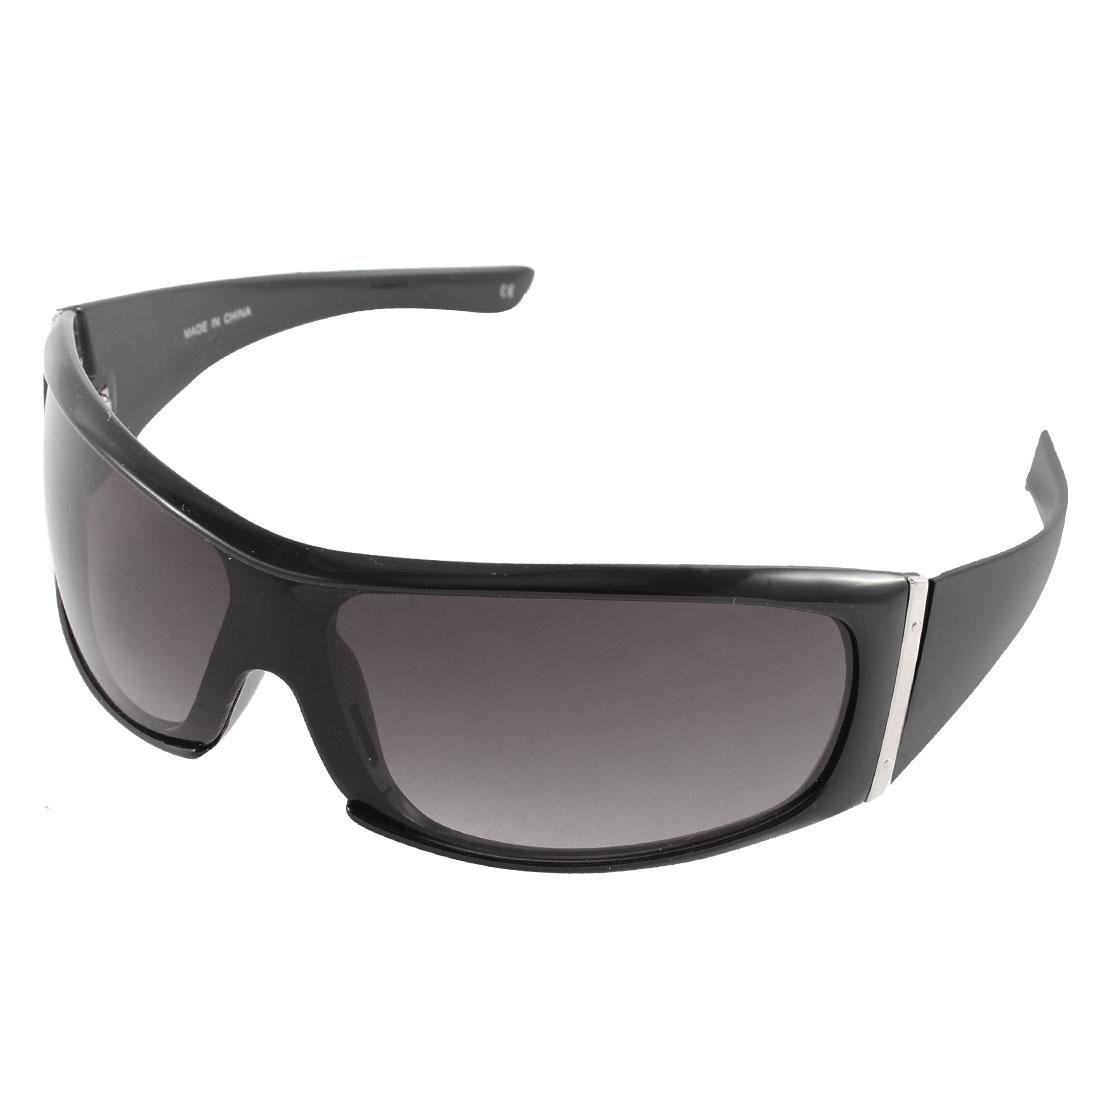 Men Wide Temple Design Sun Protective Outdoor Eyewear Sunglasses Black